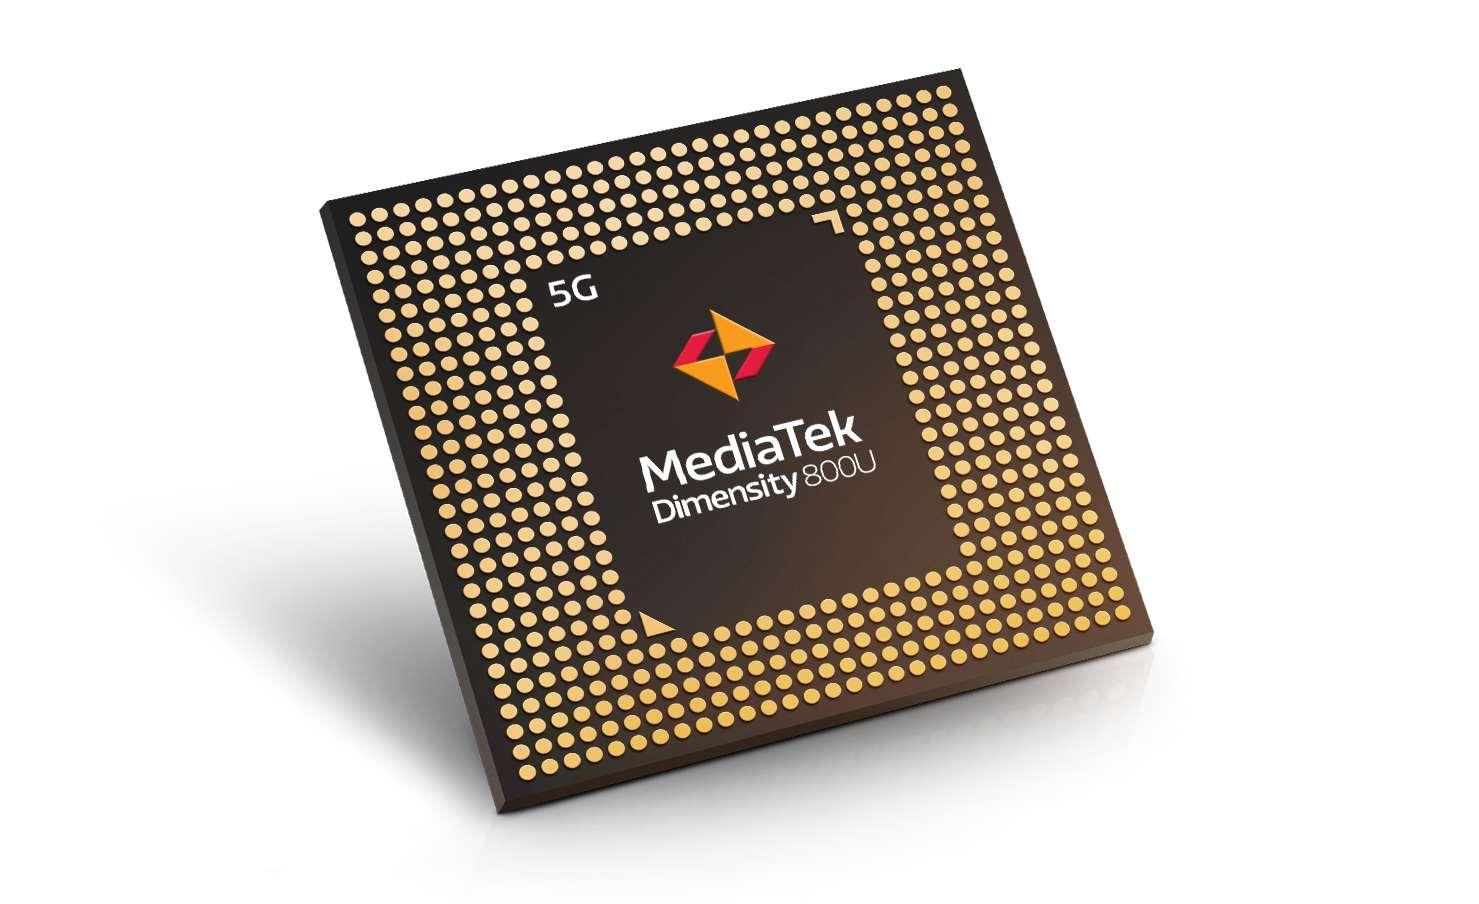 MediaTek Dimensity 800U Diperkenalkan, Andalkan Dual SIM 5G